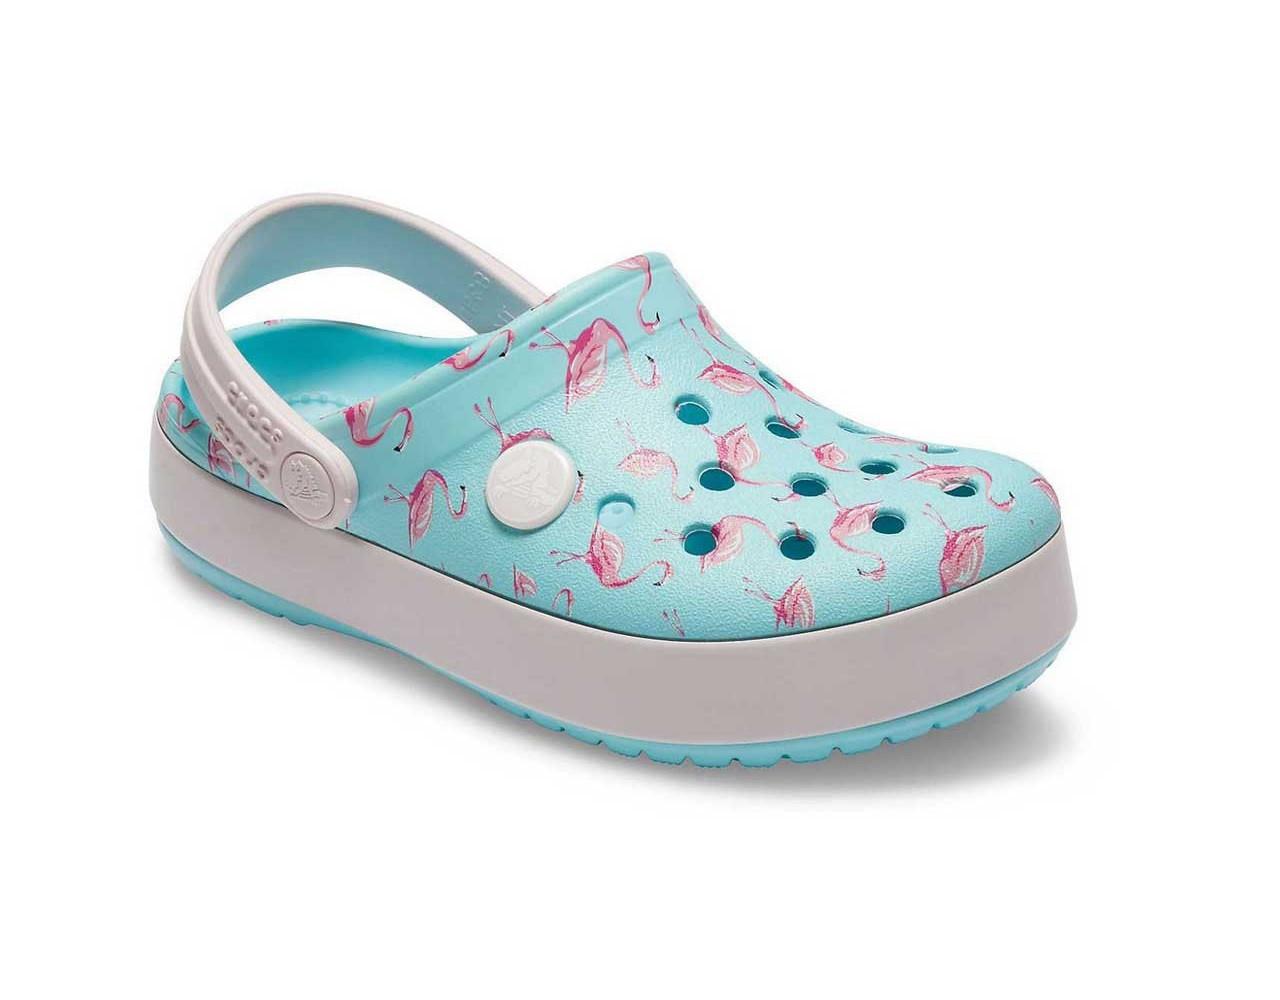 CROCS Kids' Crocband™ Multigraphic Clogs Flamingo Детские Кроксы Сабо